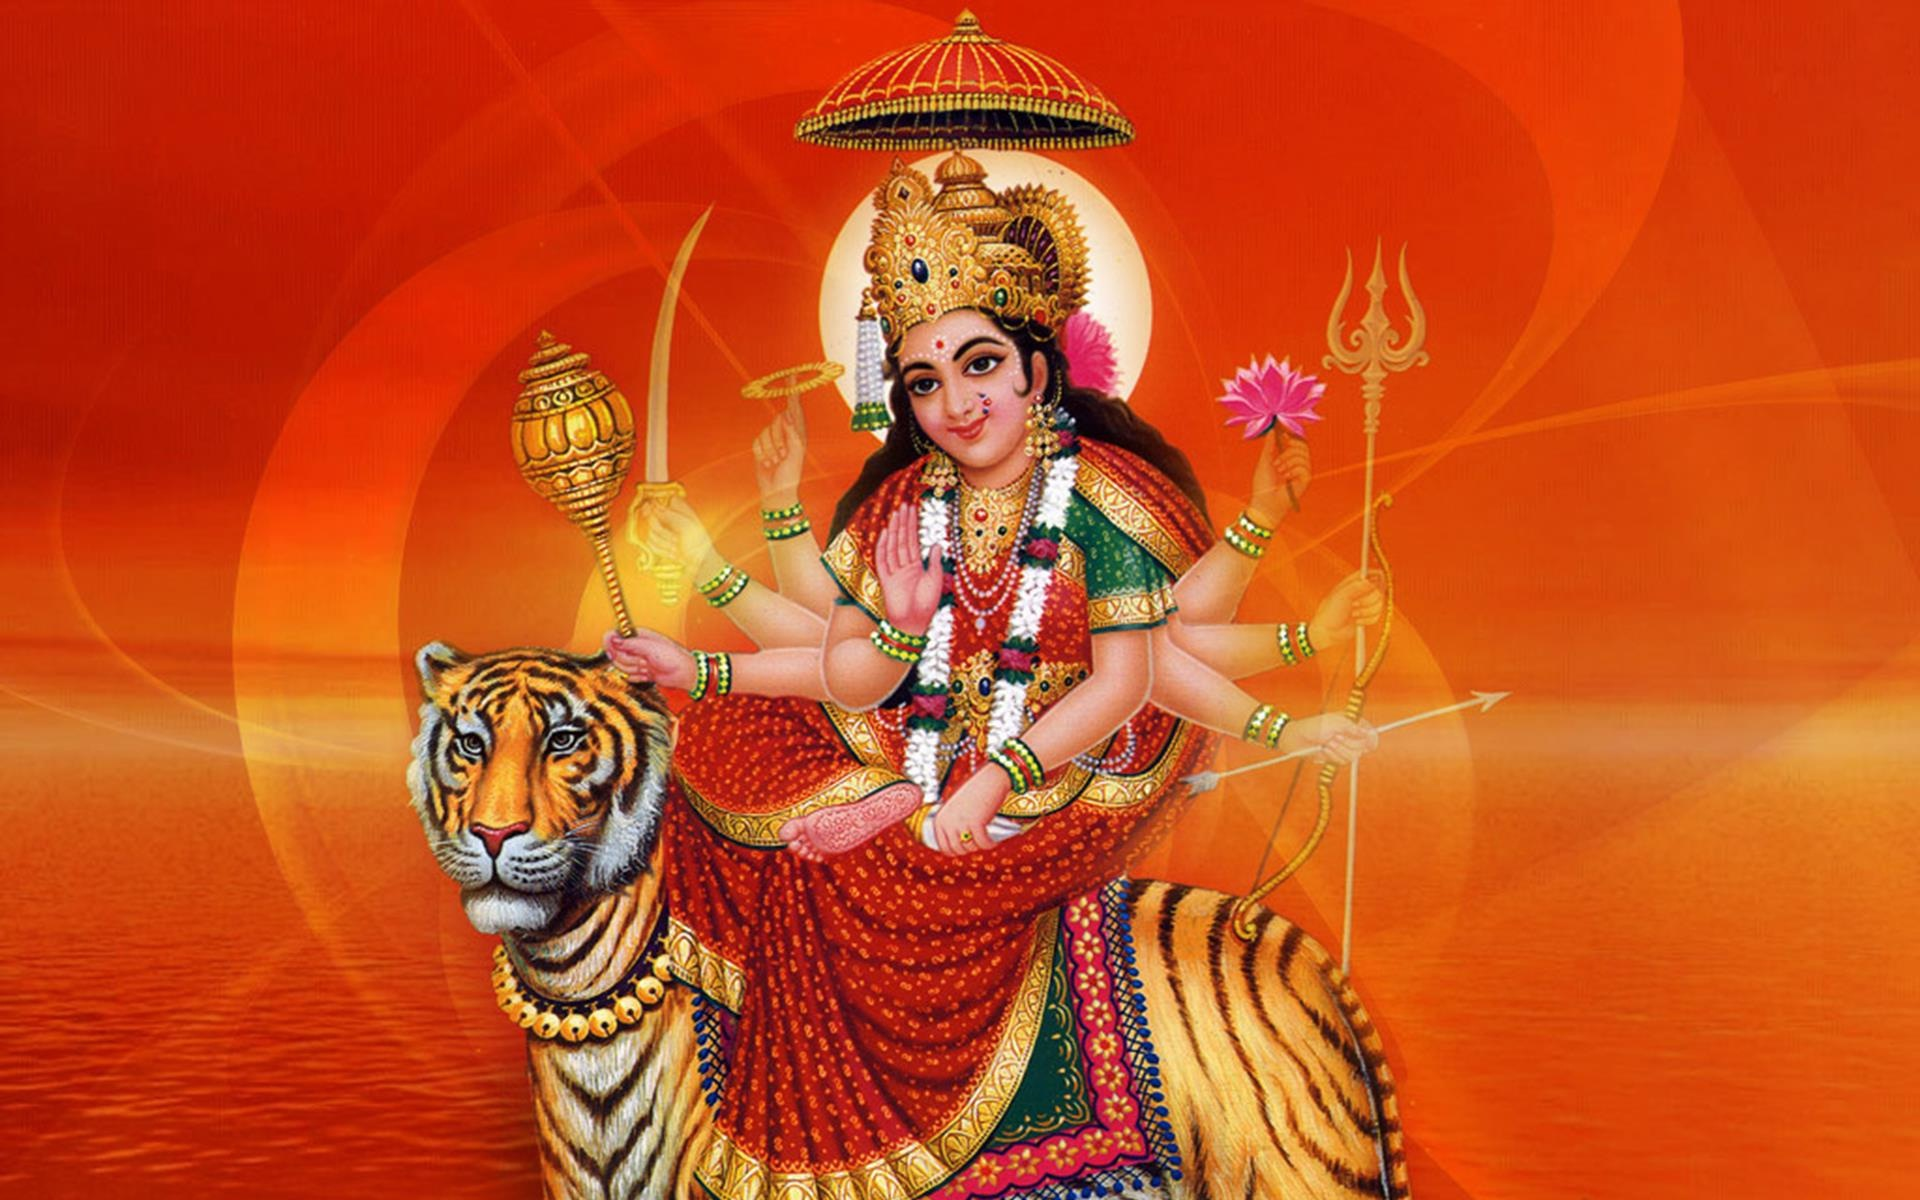 Durga Mataji Happy Navratri Wallpaper Maa Durga Pic Whatsapp Dp 1920x1200 Wallpaper Teahub Io